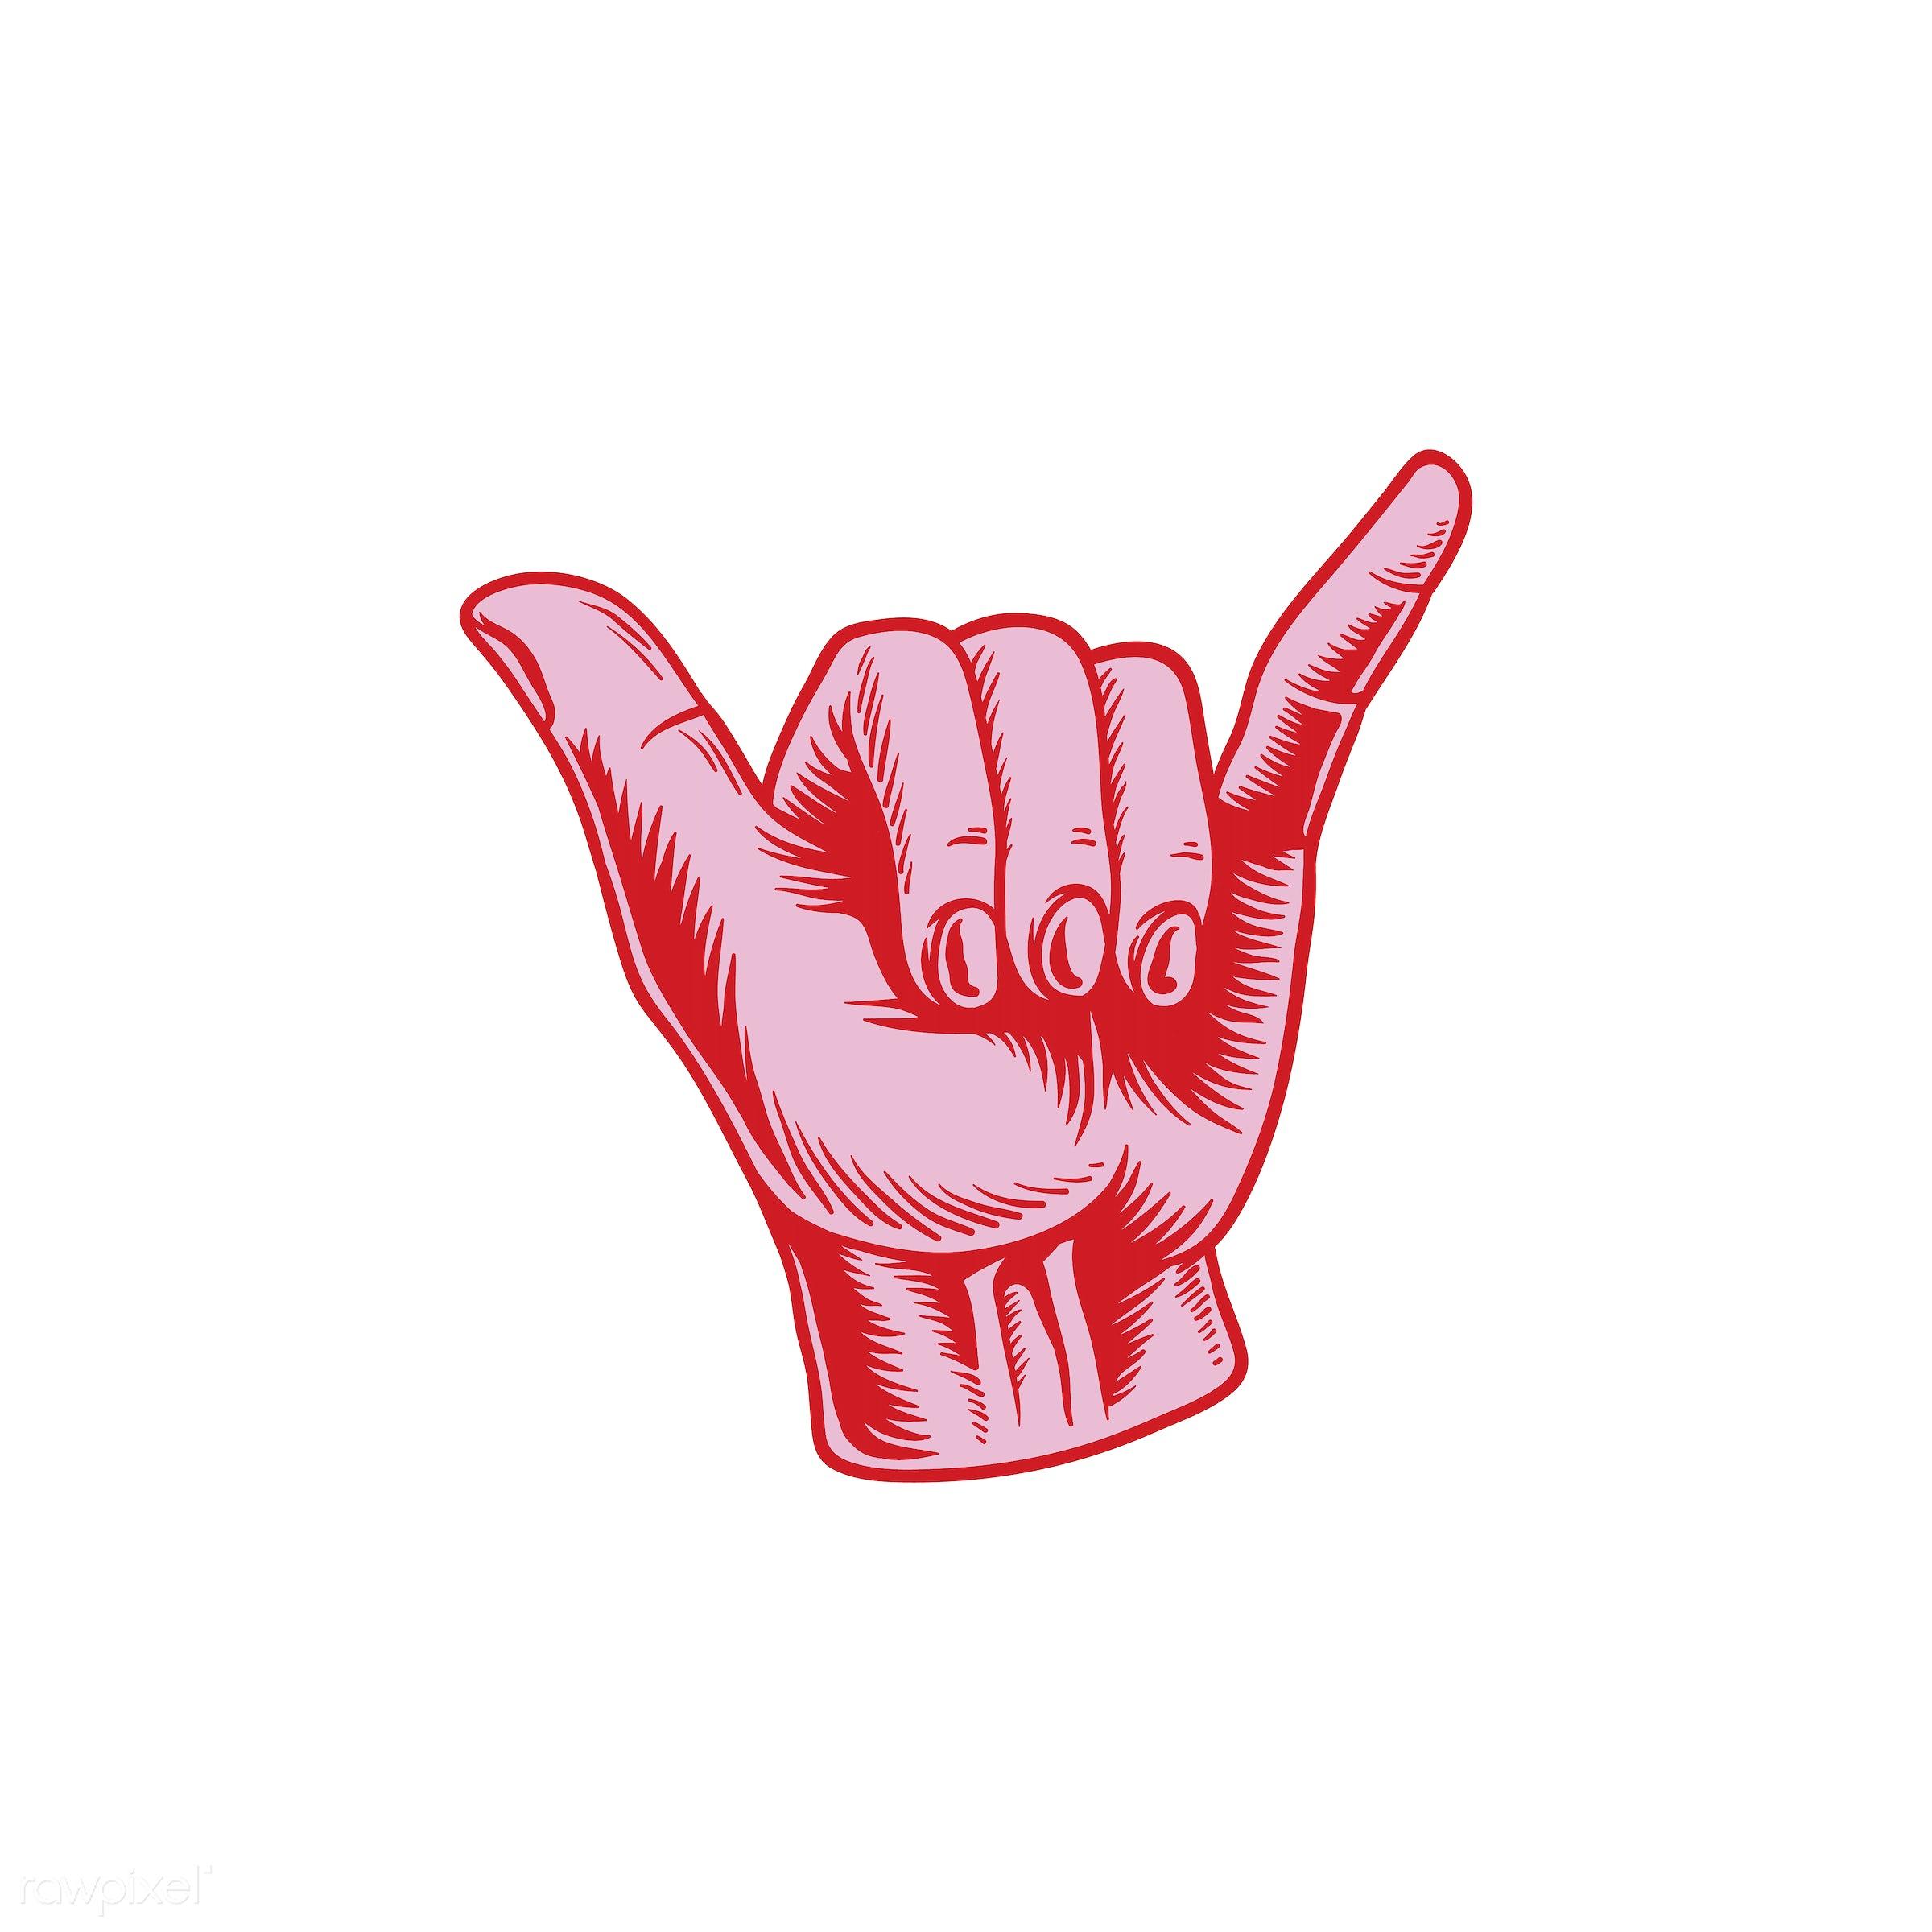 Illustration of rock and roll hand sign - artwork, communication, creative, design, flat design, gesture, graphic, hand,...